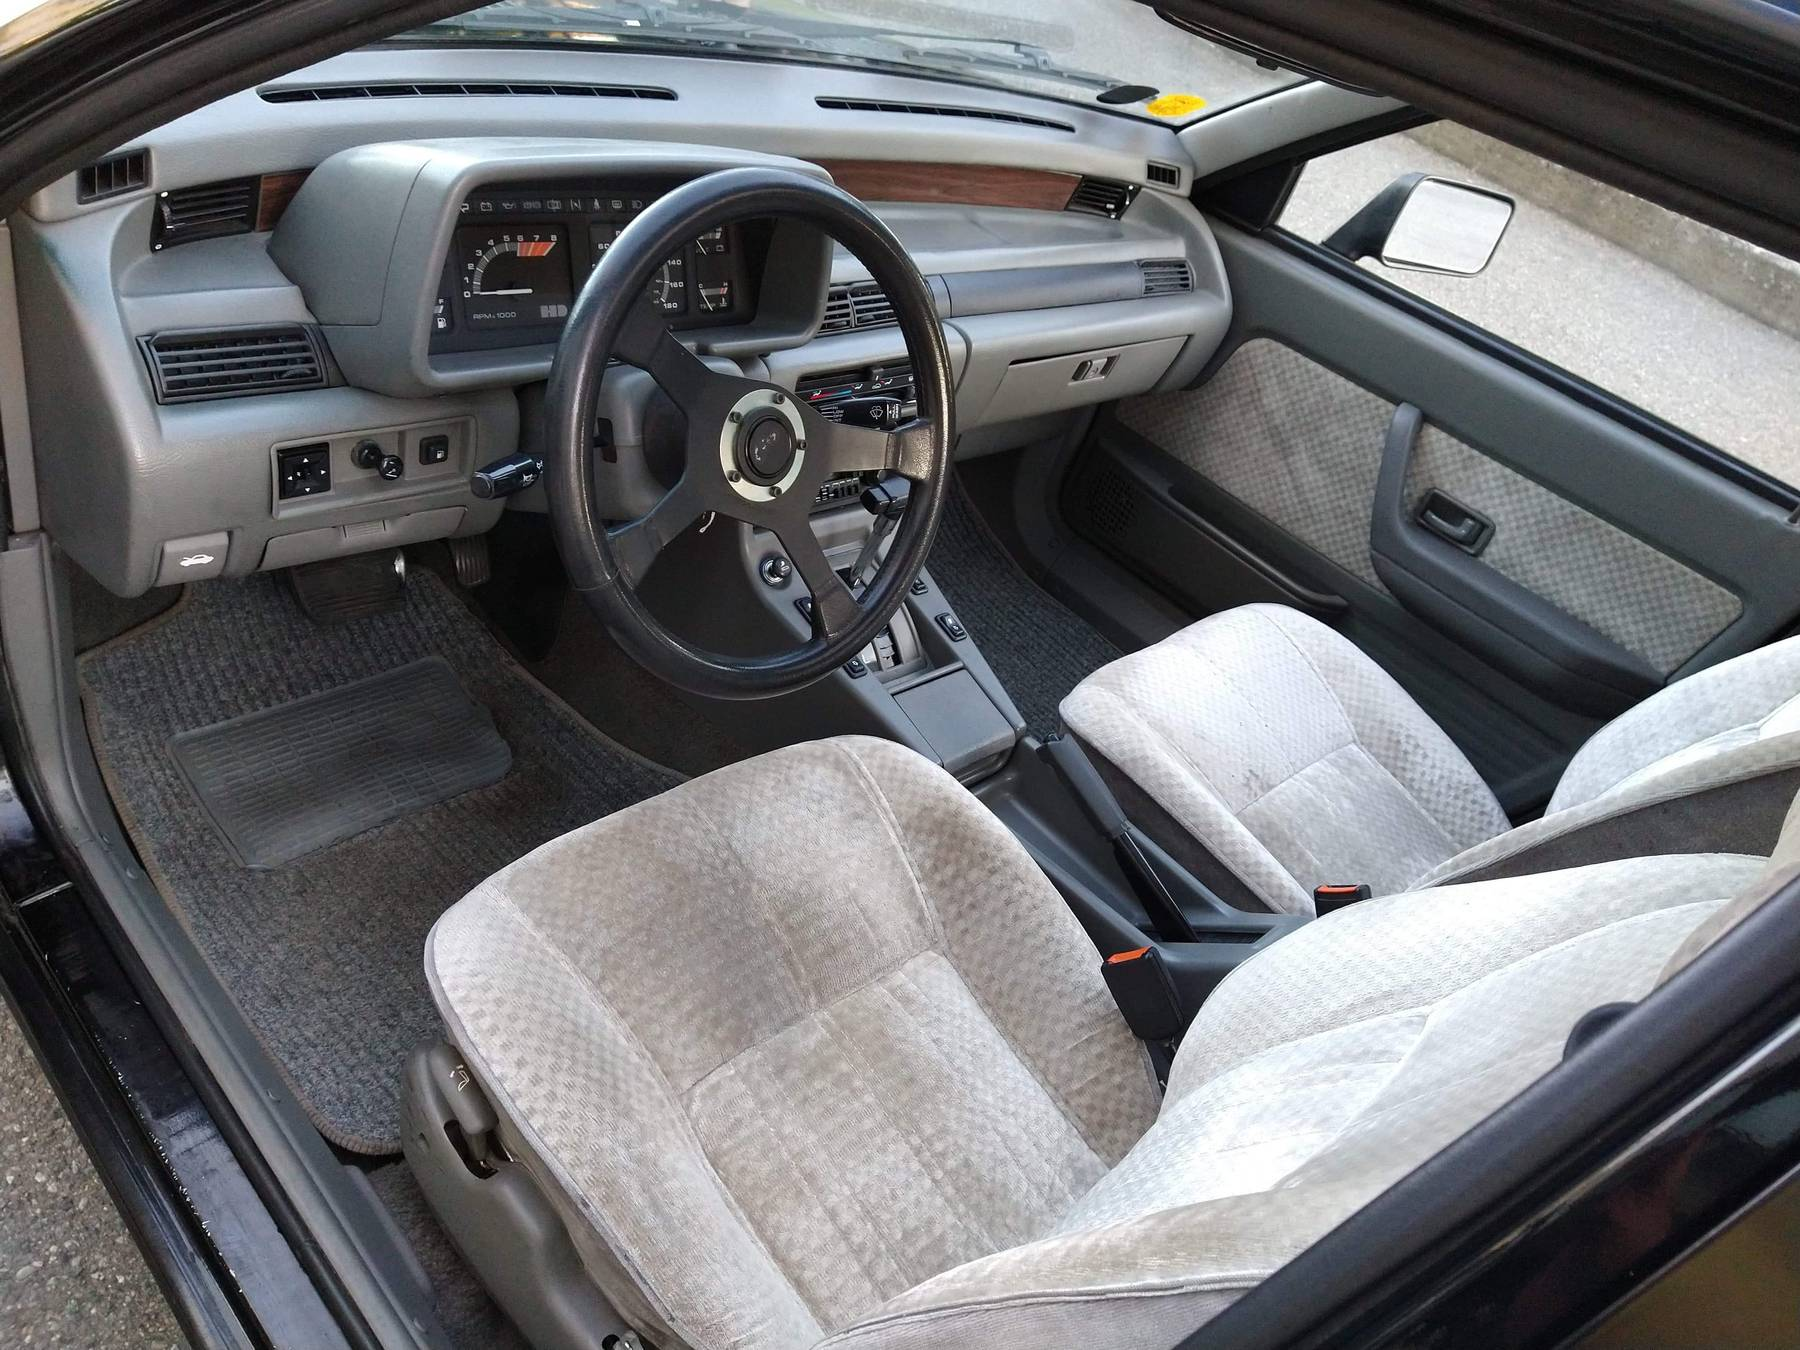 1986 Hyundai Stellar Executive interior drivers side